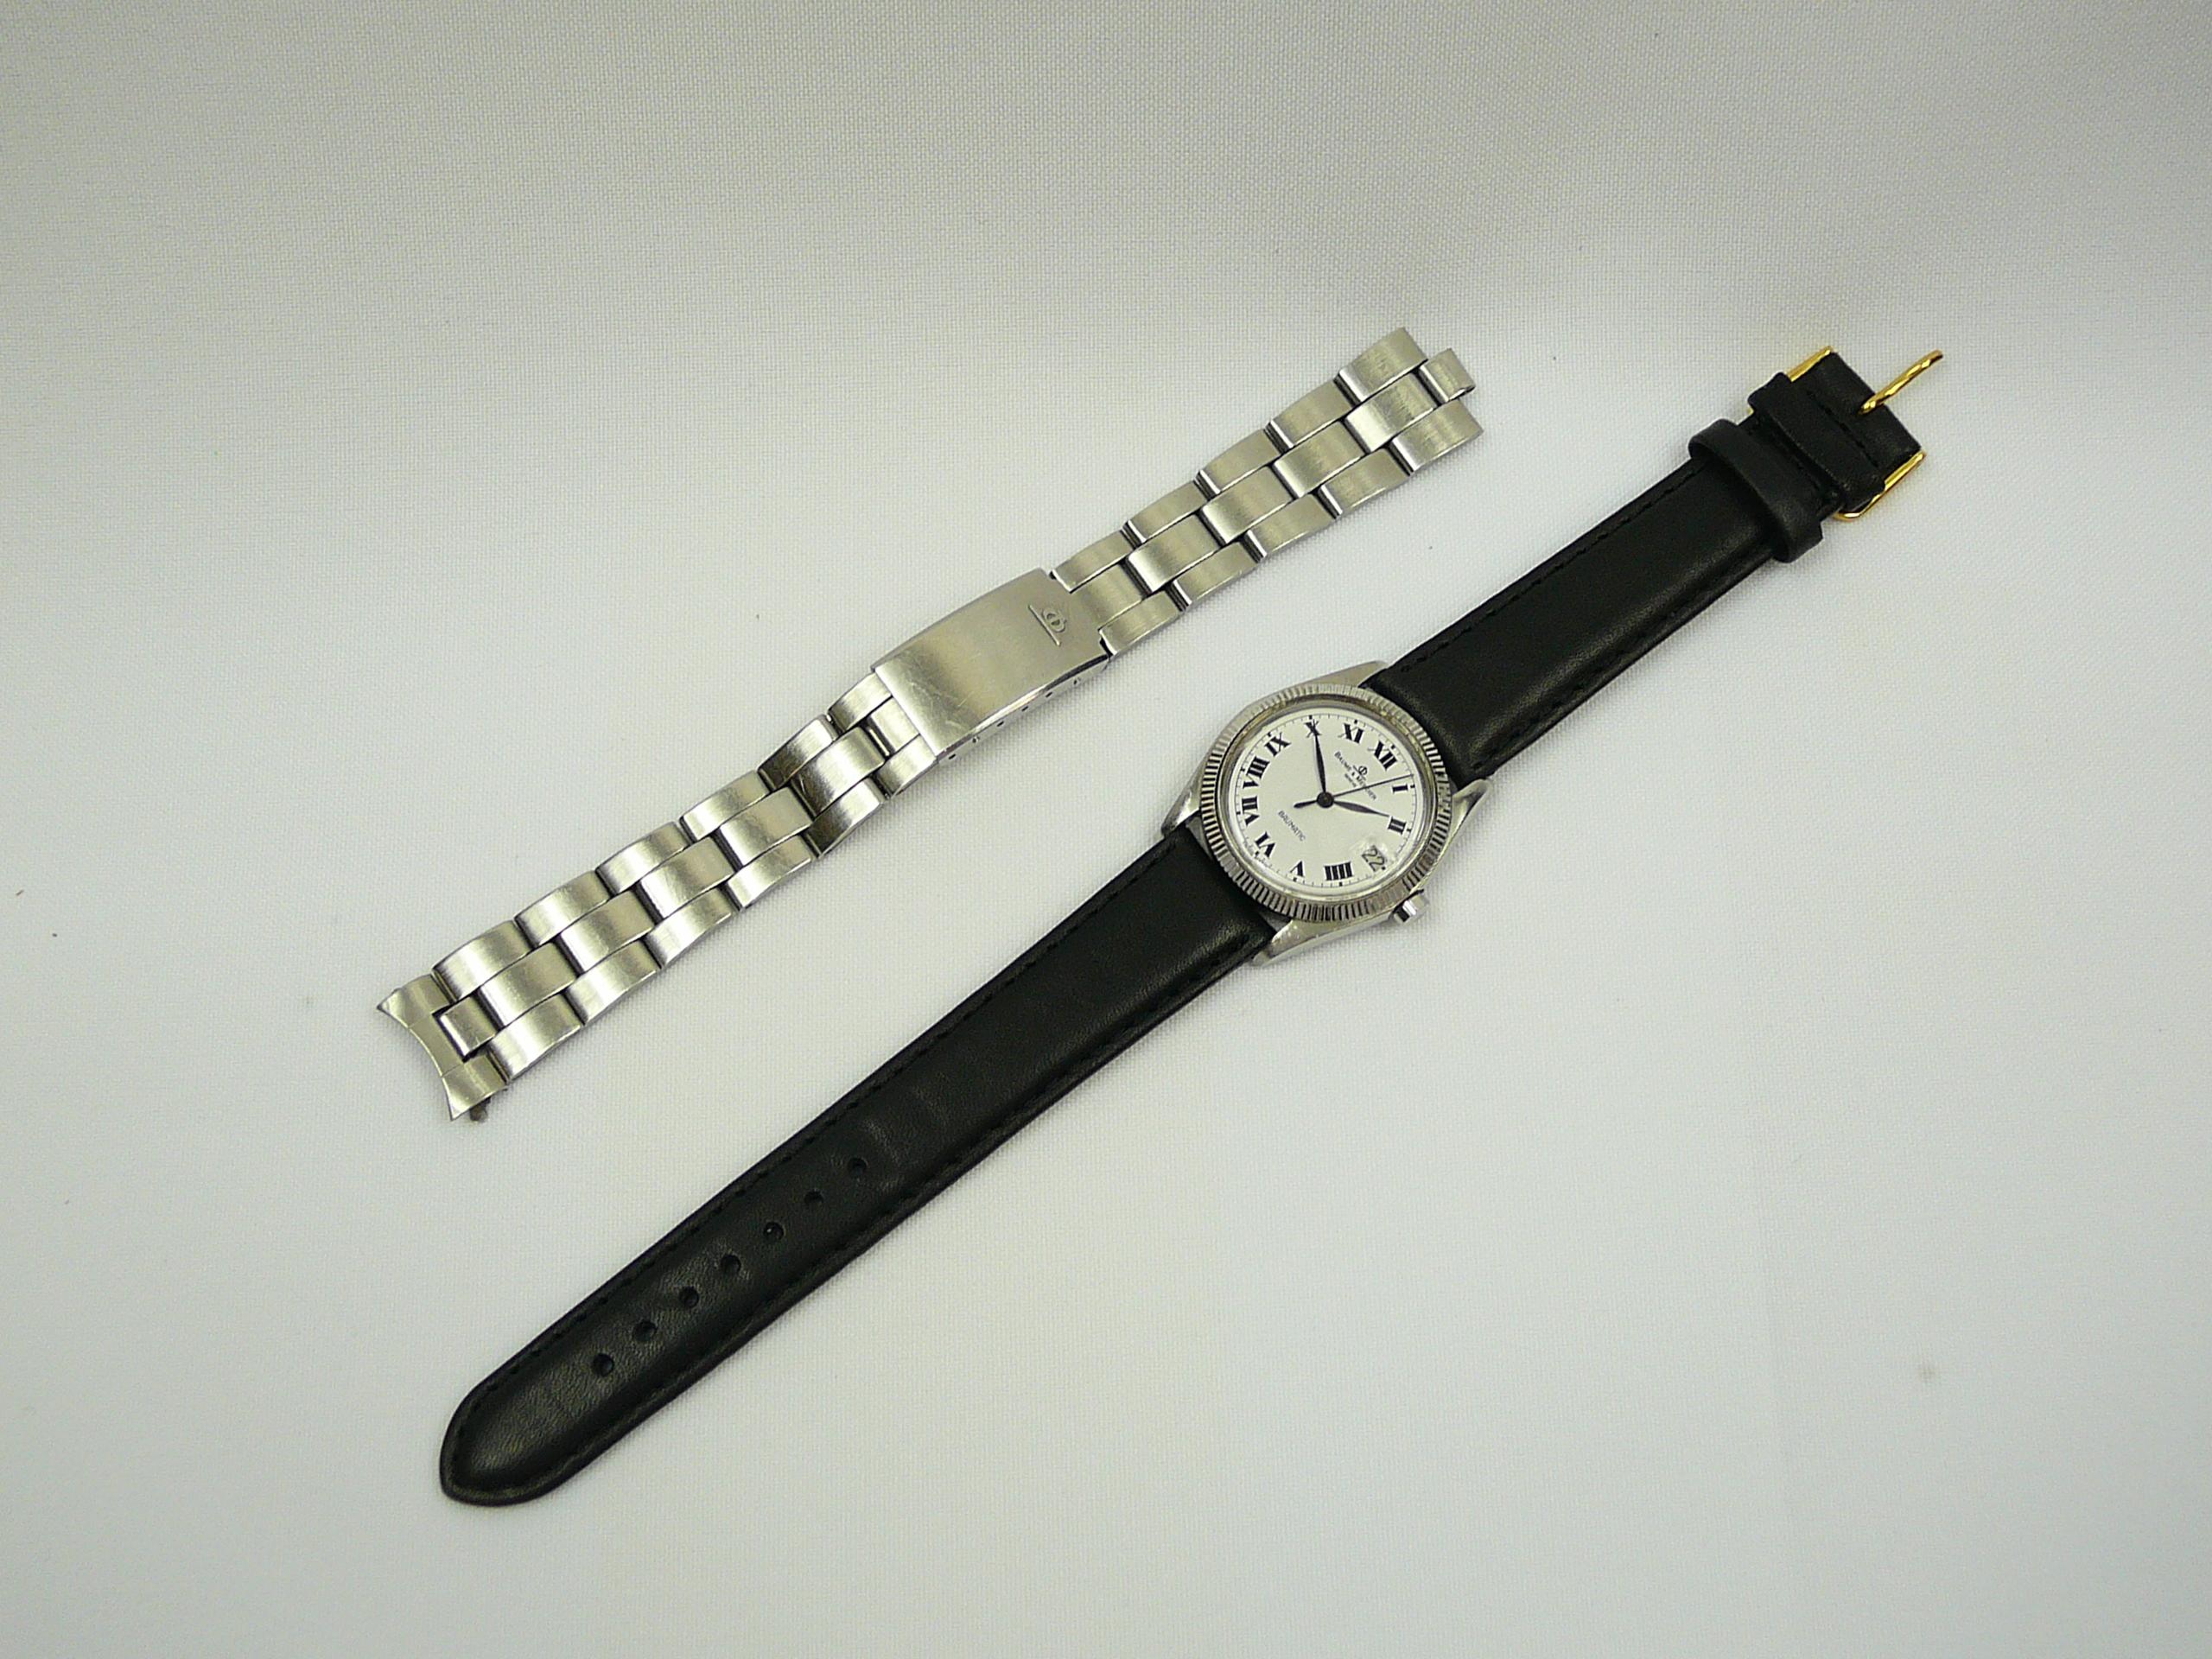 Mid Size Baume & Mercier Wrist Watch - Image 3 of 4